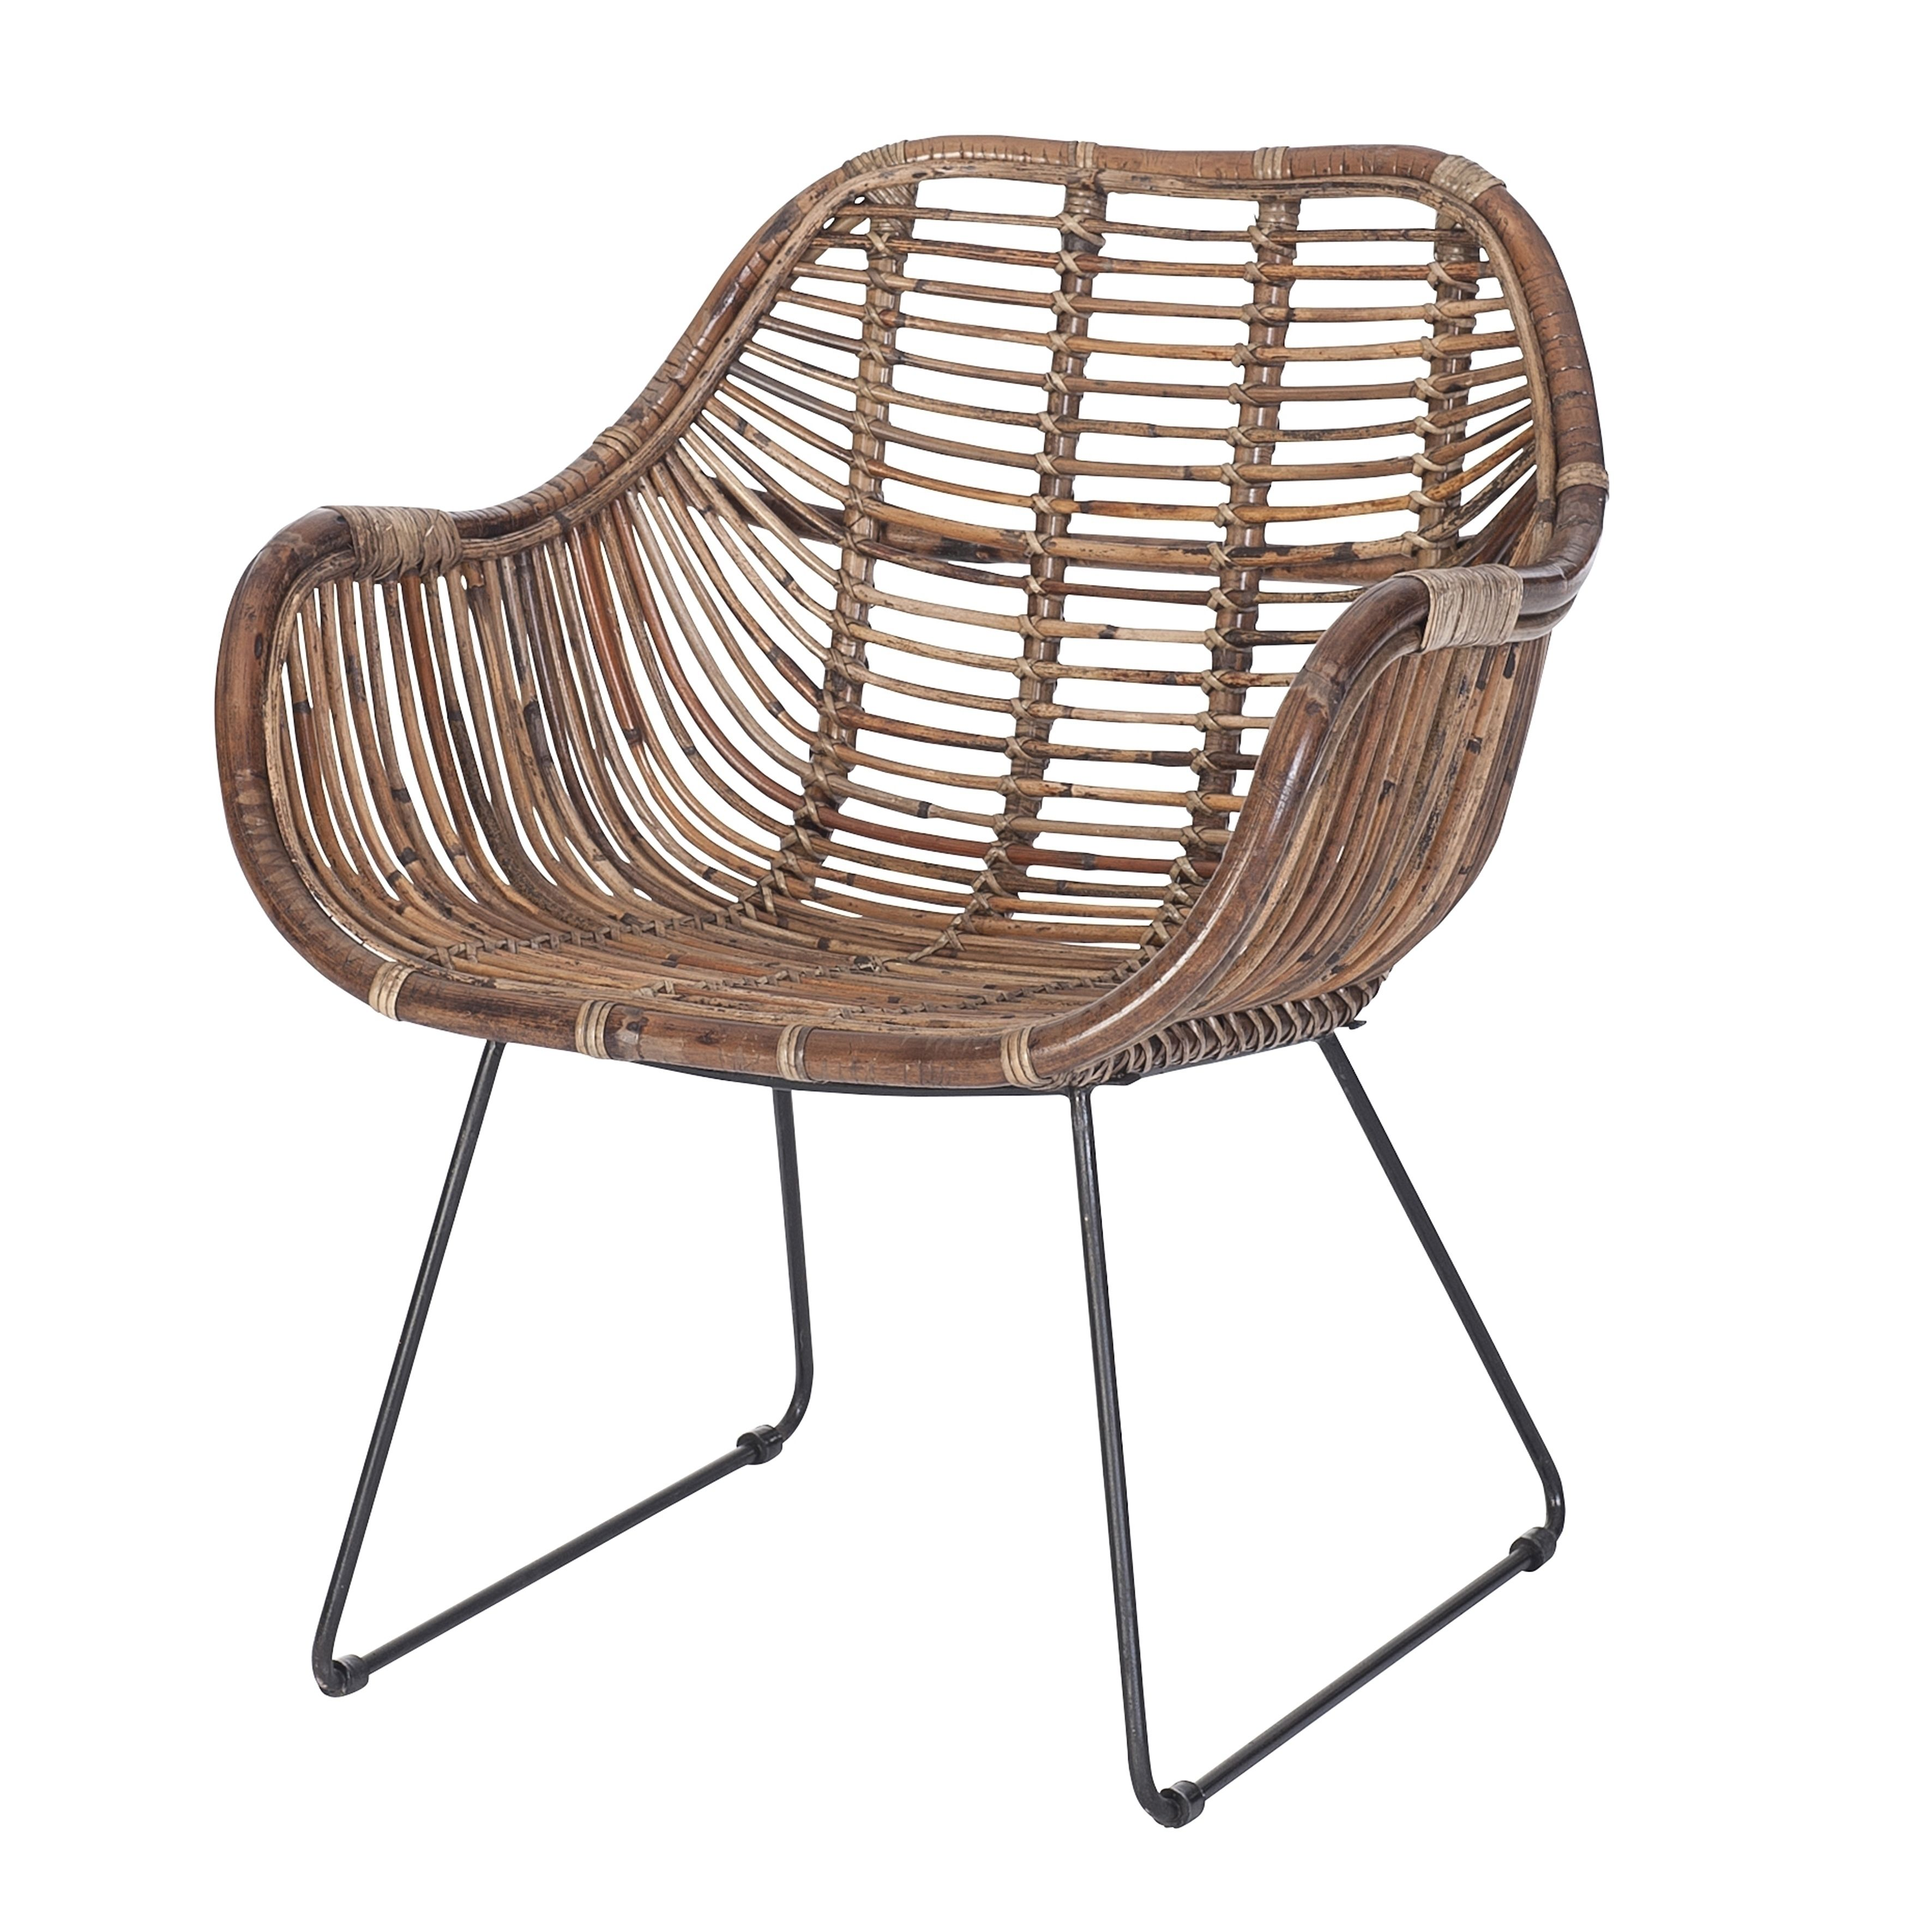 Hangstoel Rotan Intratuin.Intratuin Diningstoel Marcel Dark Rattan Grey Tuin